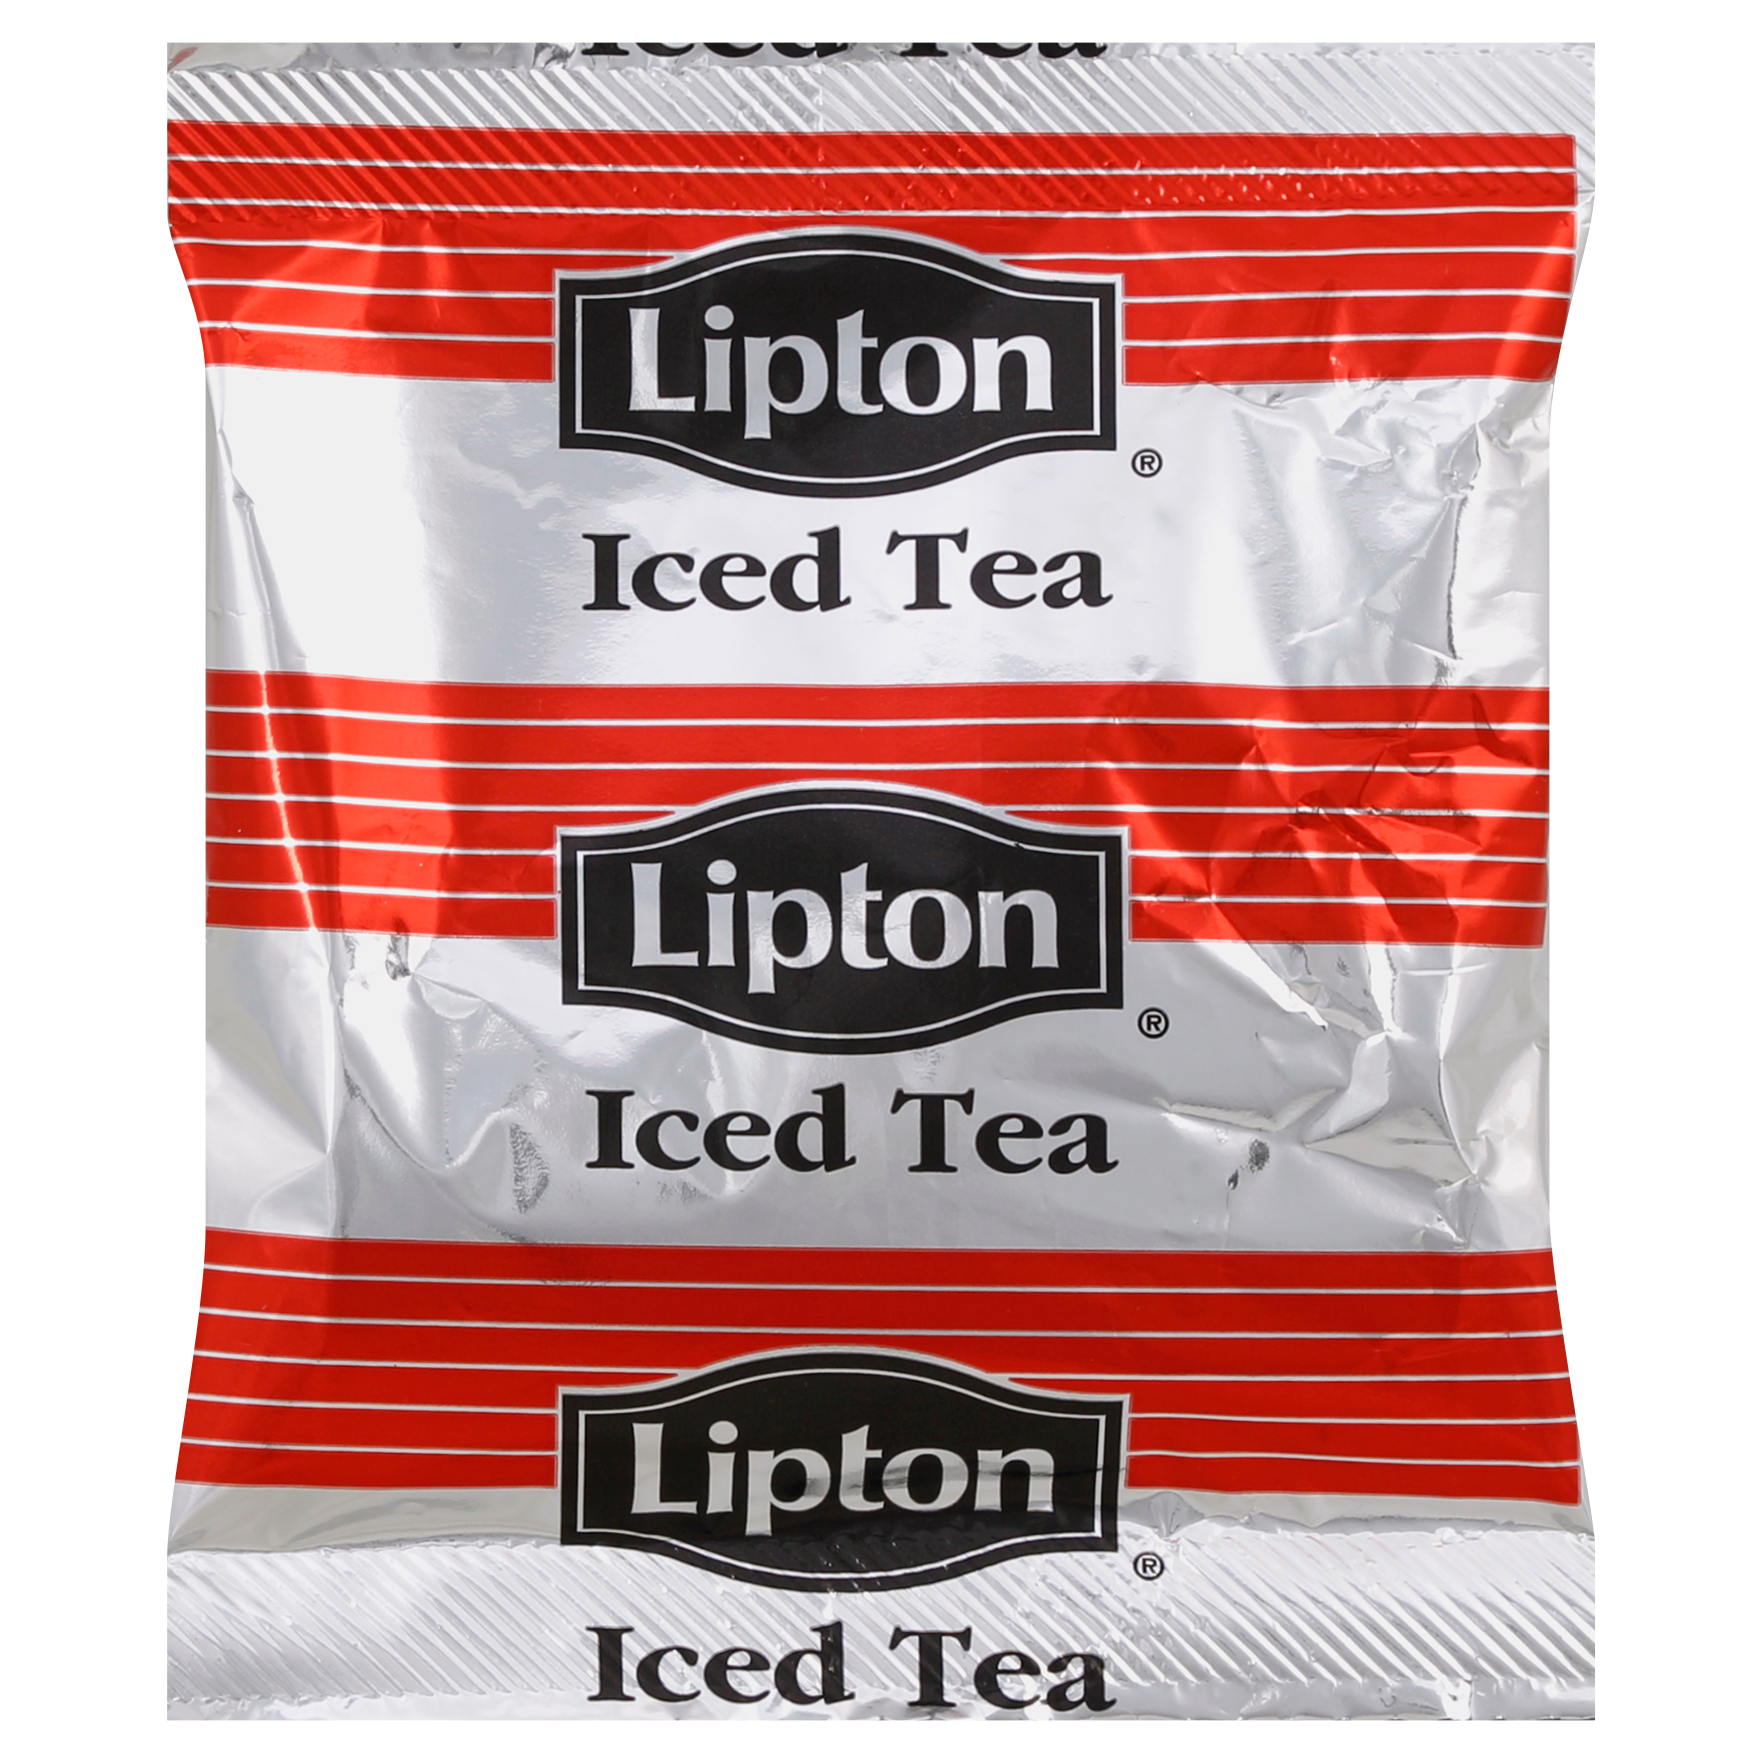 Lipton® Iced Unsweetened Black Tea 3 gallon, 24 count -